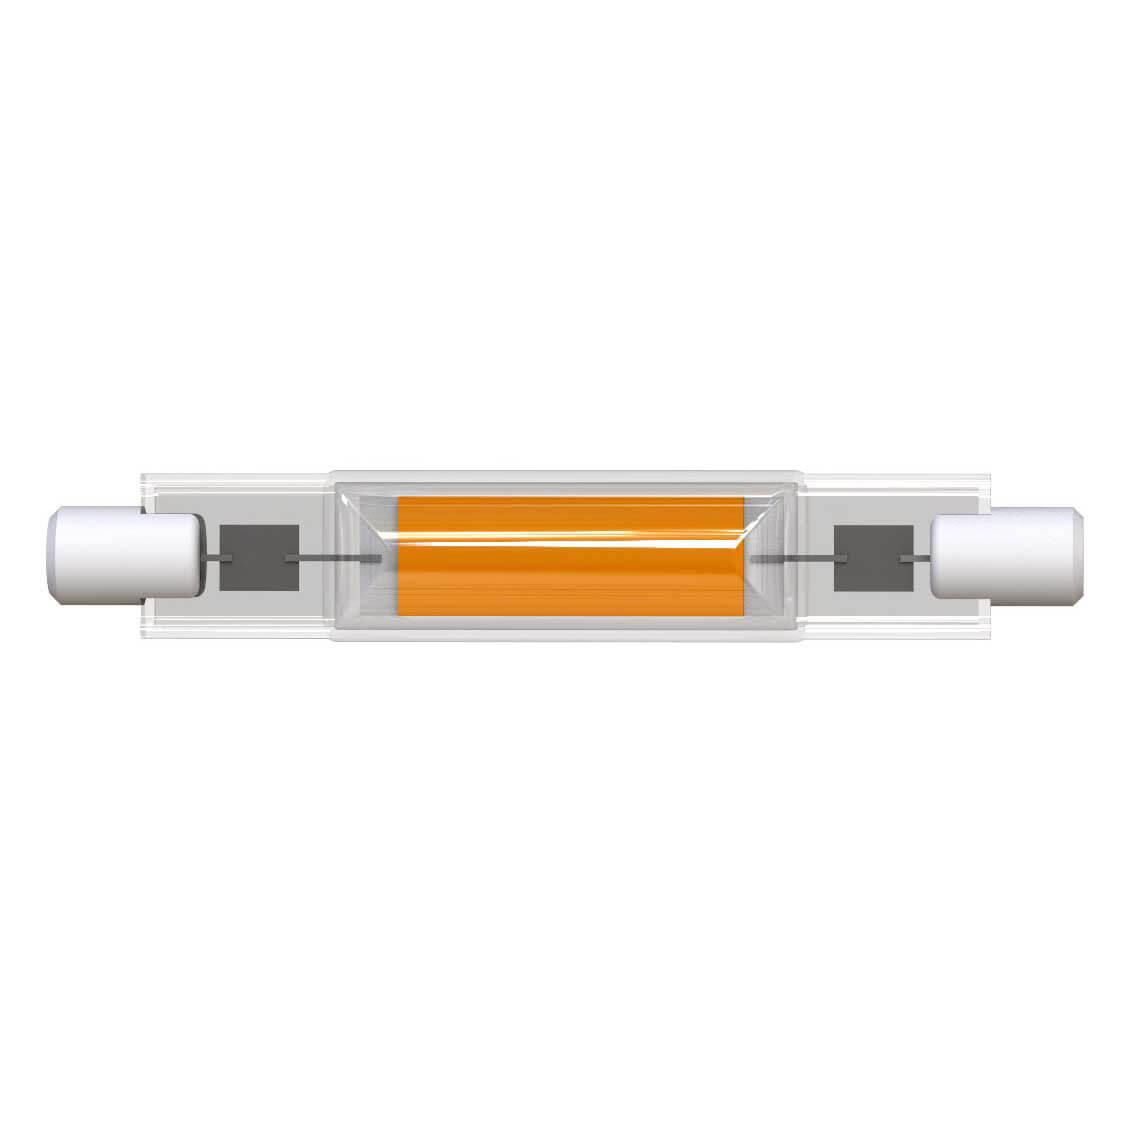 Лампочка Uniel LED-J78-7W/3000K/R7s/CL GLZ07TR LED-J78